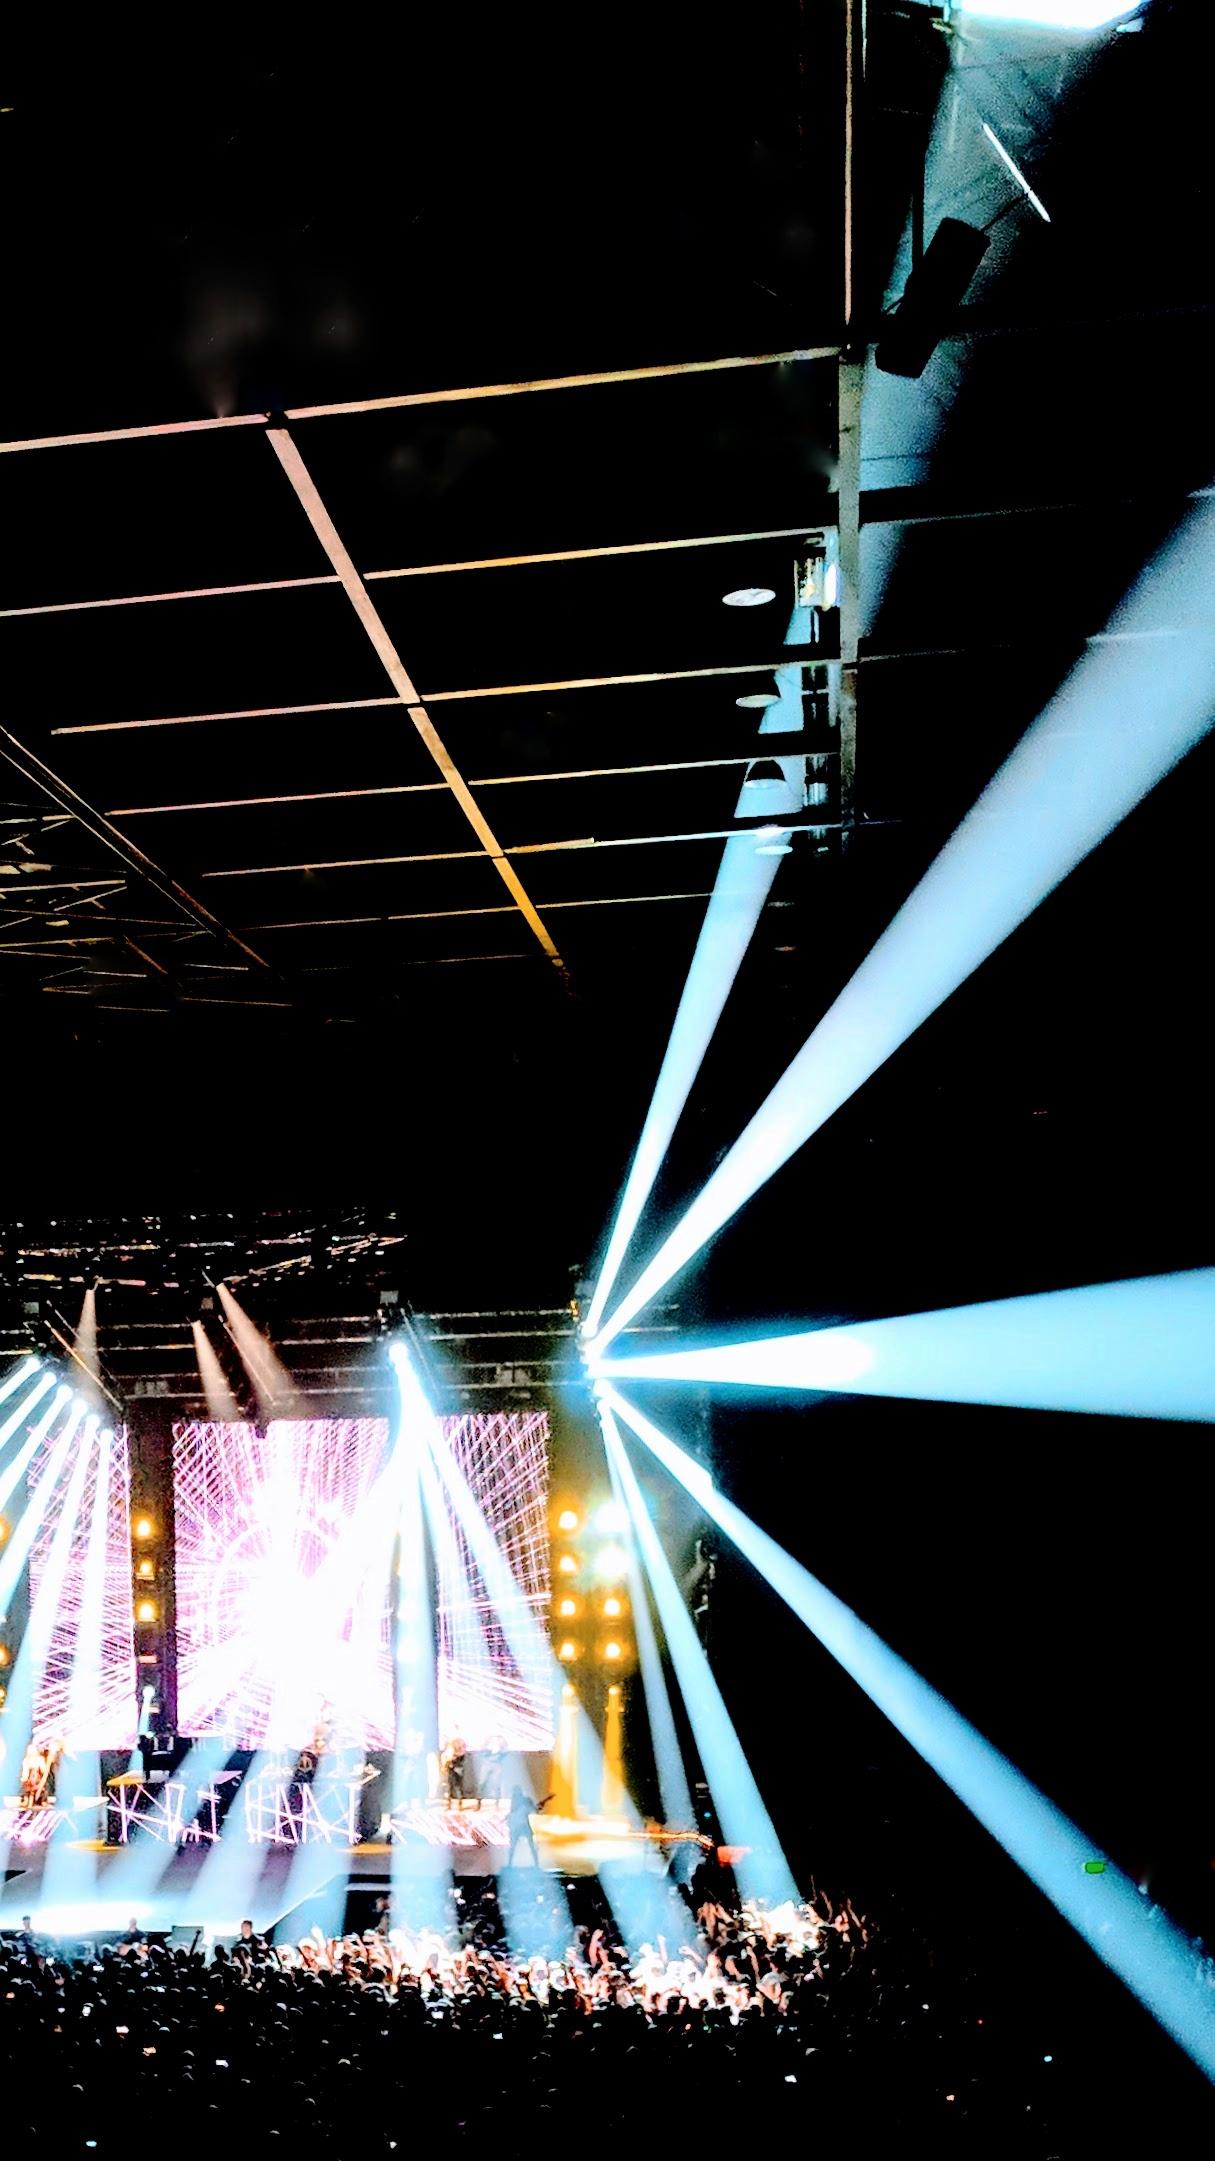 Panic! At The Disco, October 2018 - beams of light